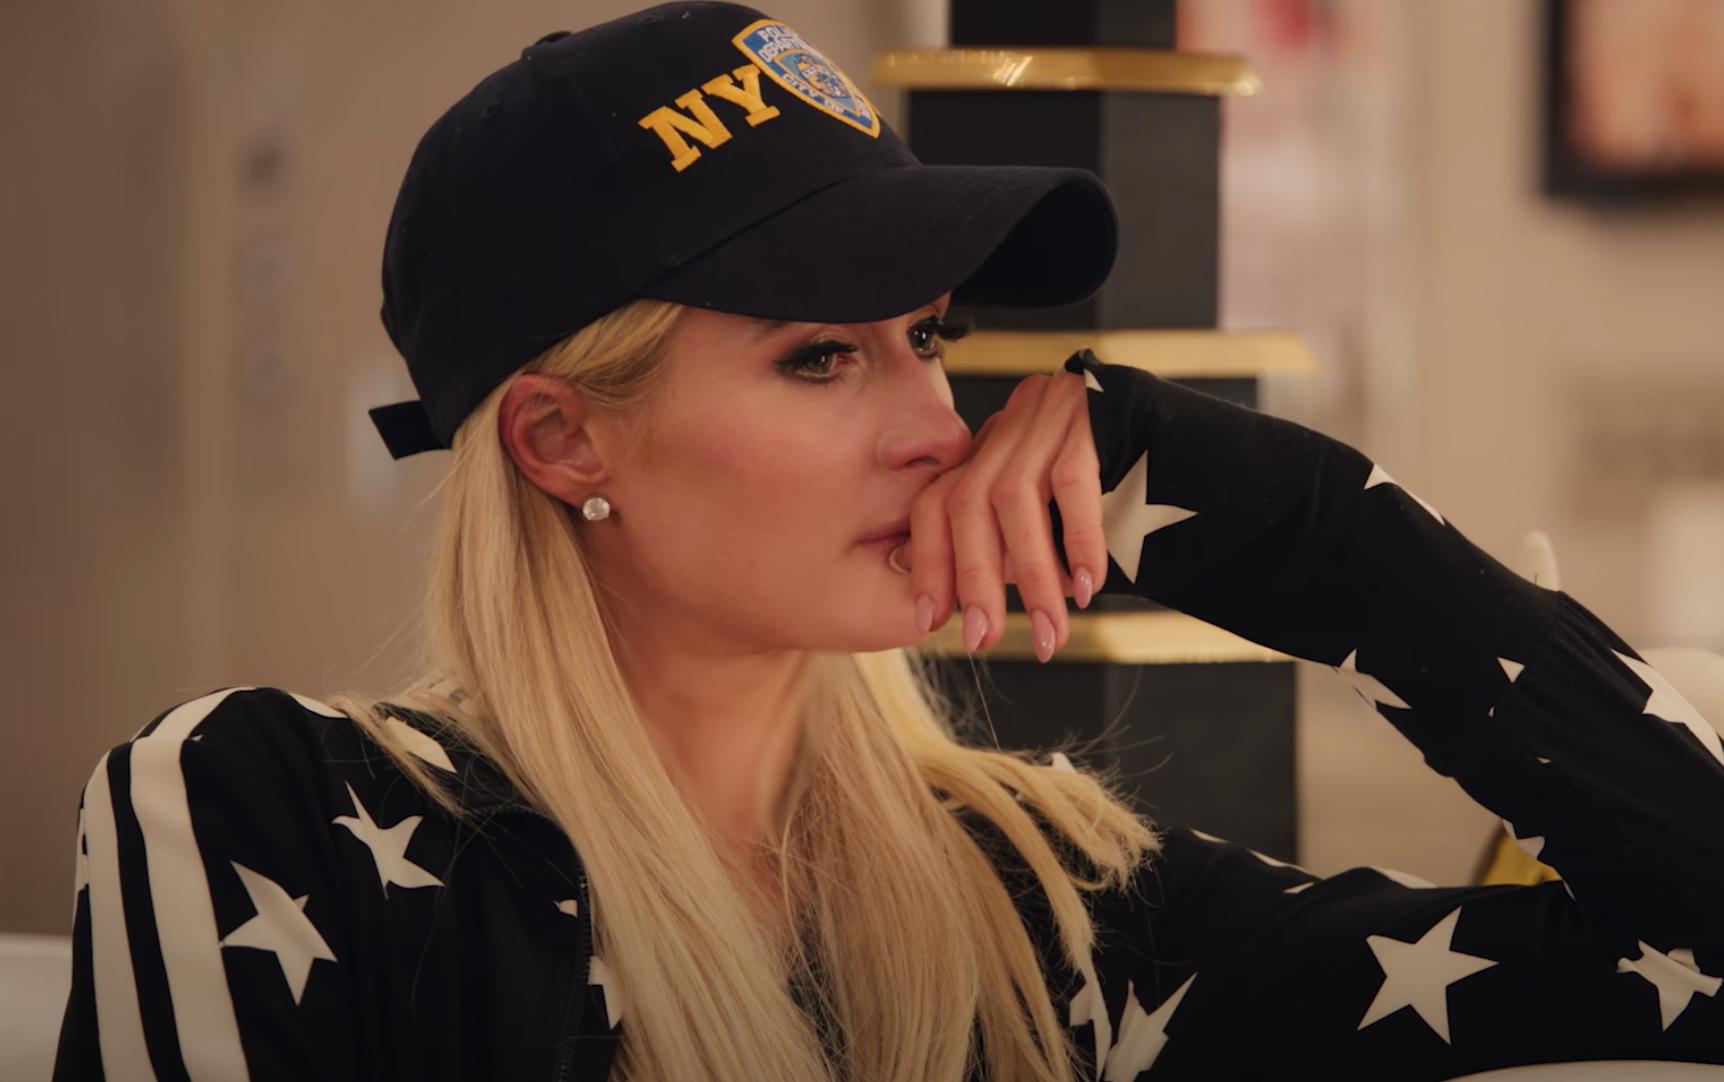 Paris Hilton addresses childhood trauma in new documentary trailer